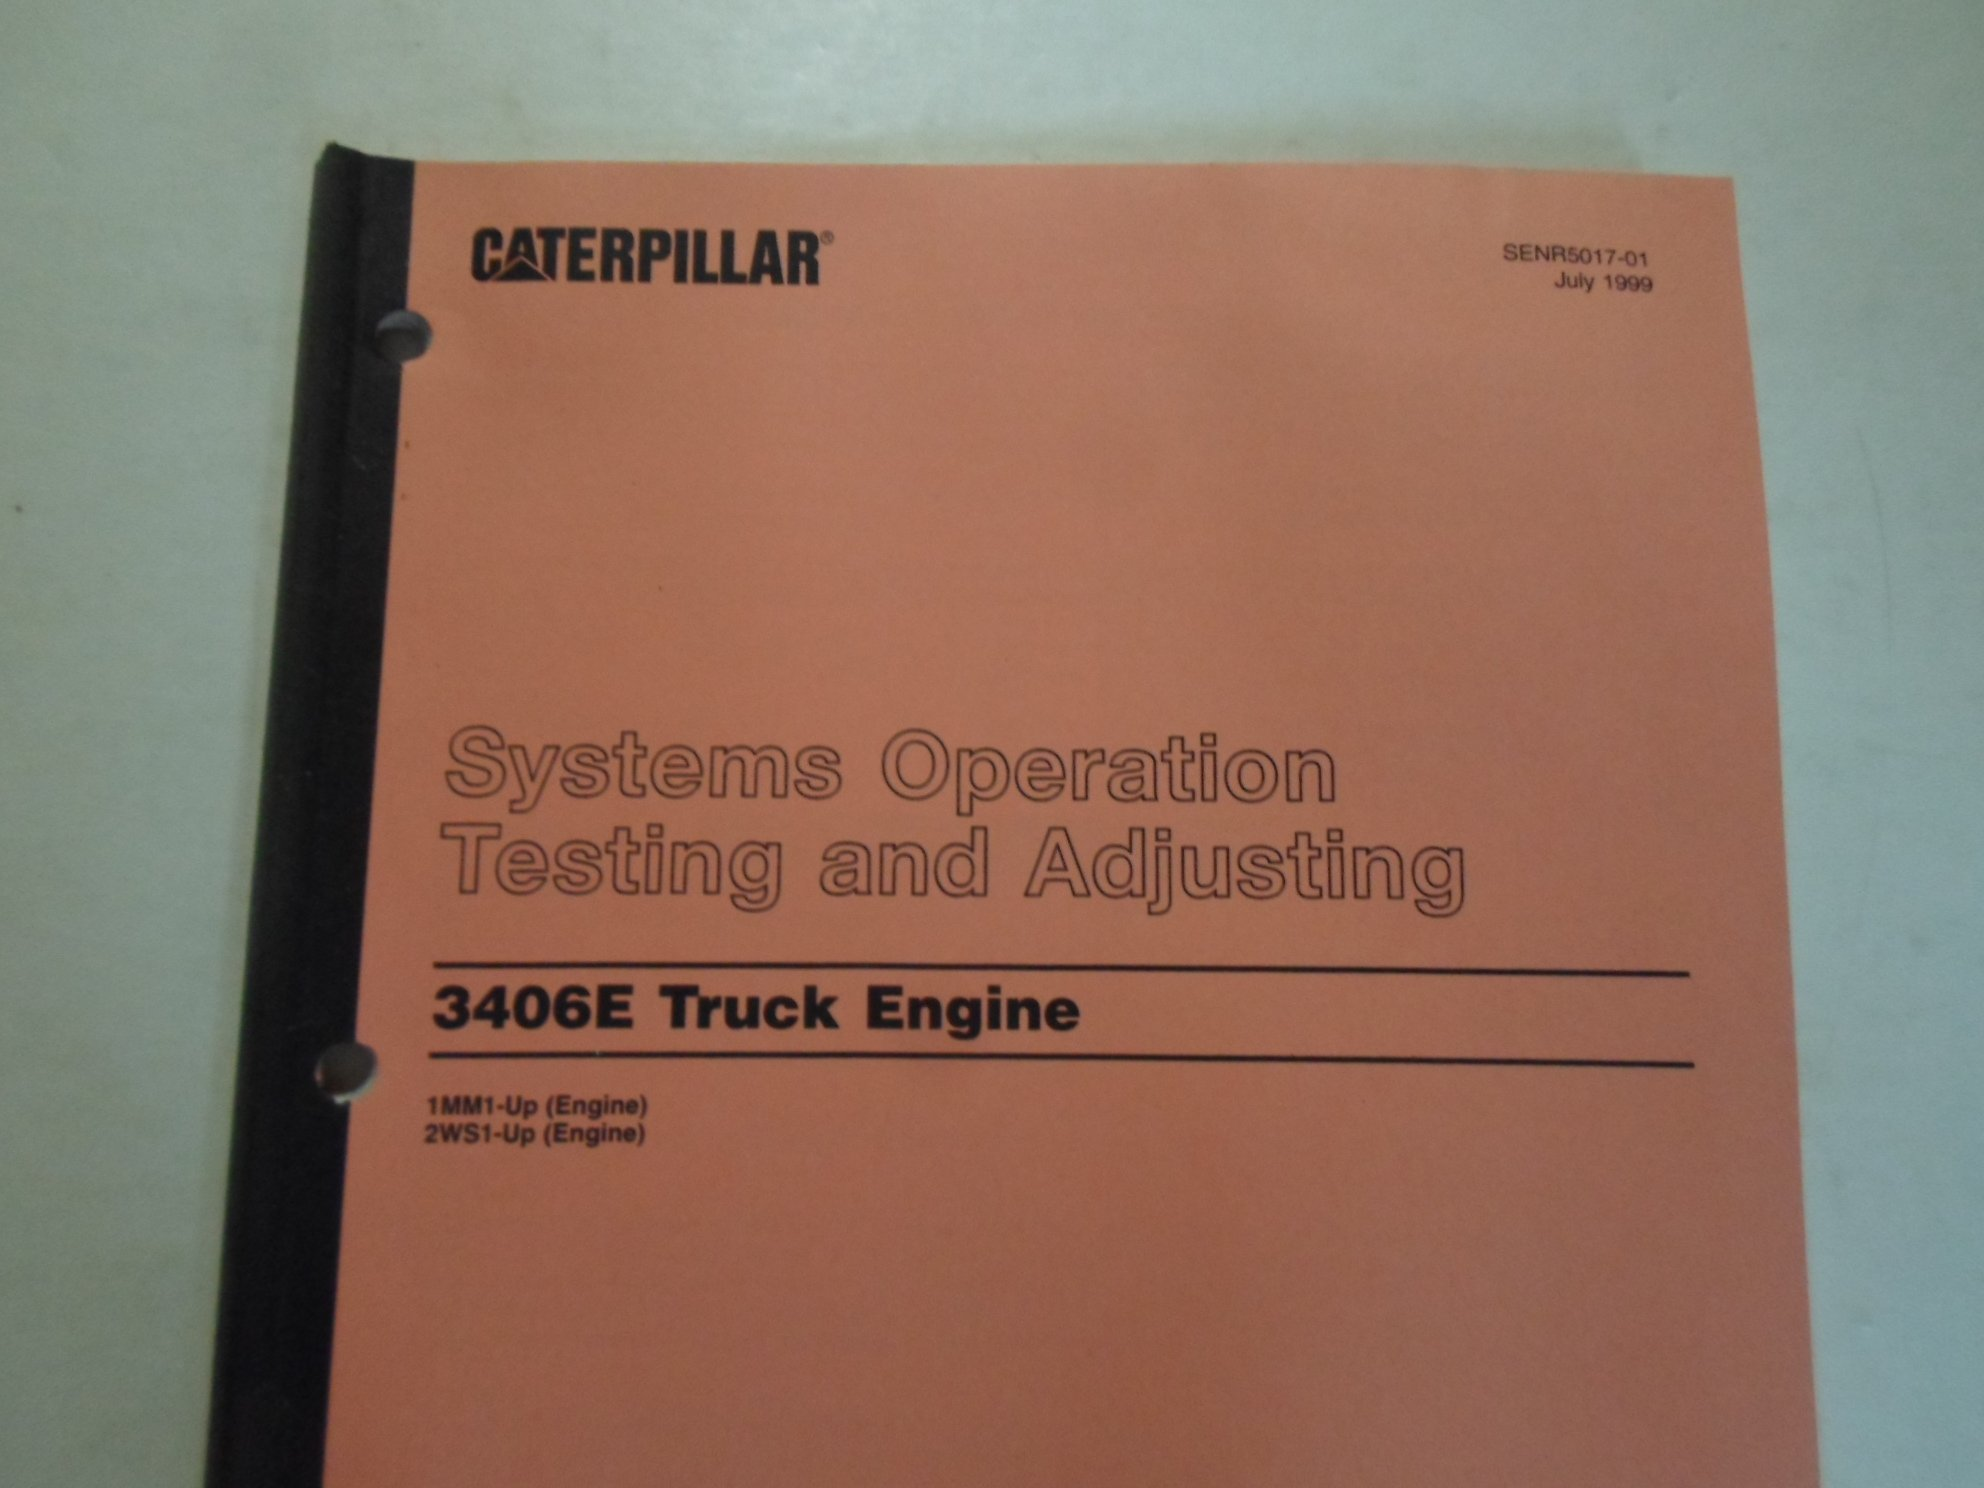 1999 Caterpillar 3406E Truck Engine Systems Operation Testing